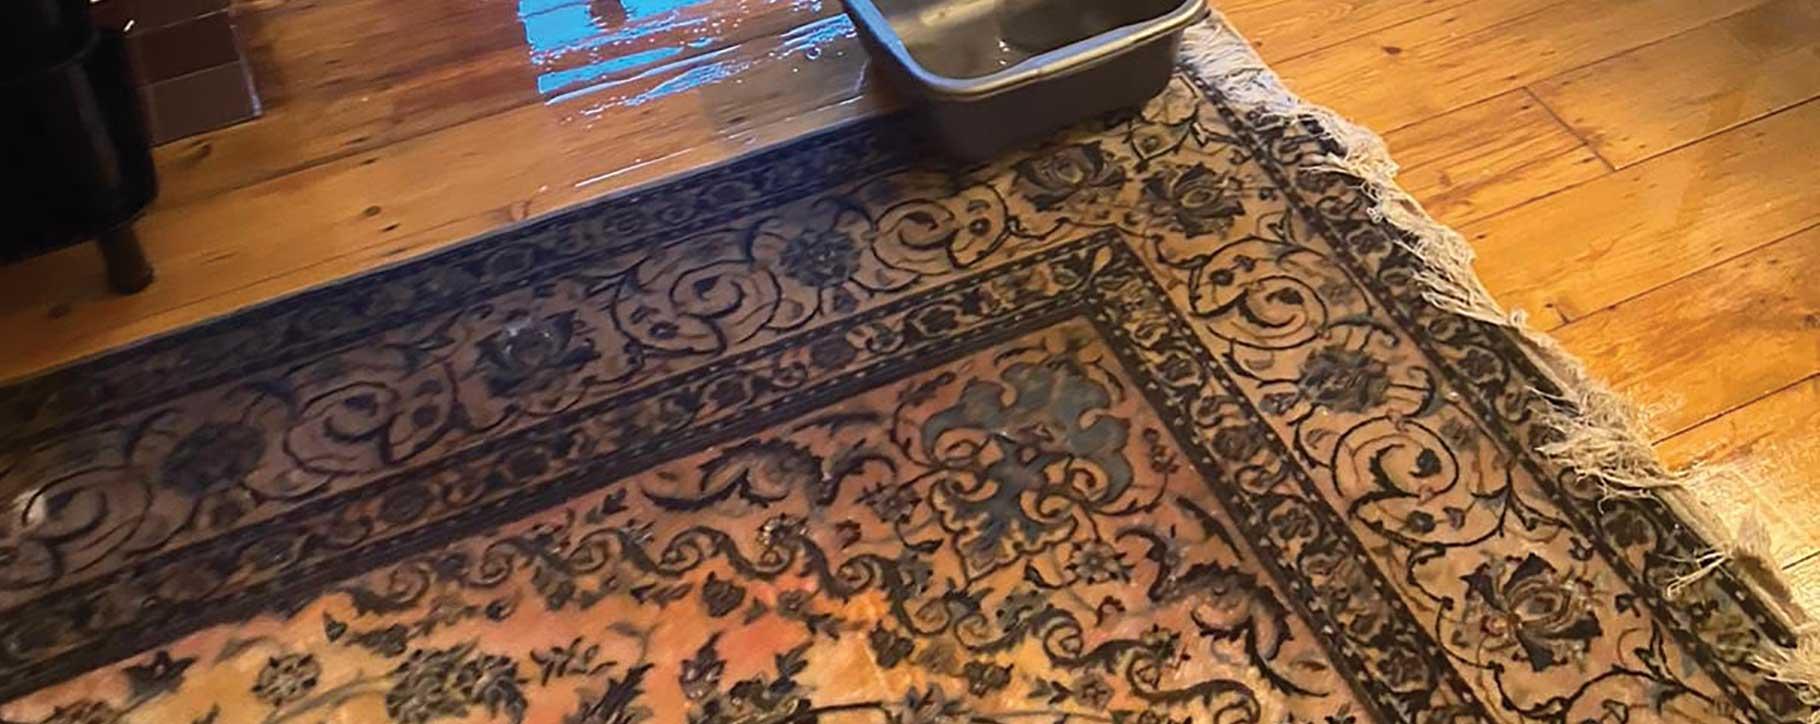 Water Damaged Persian Rug Restoration